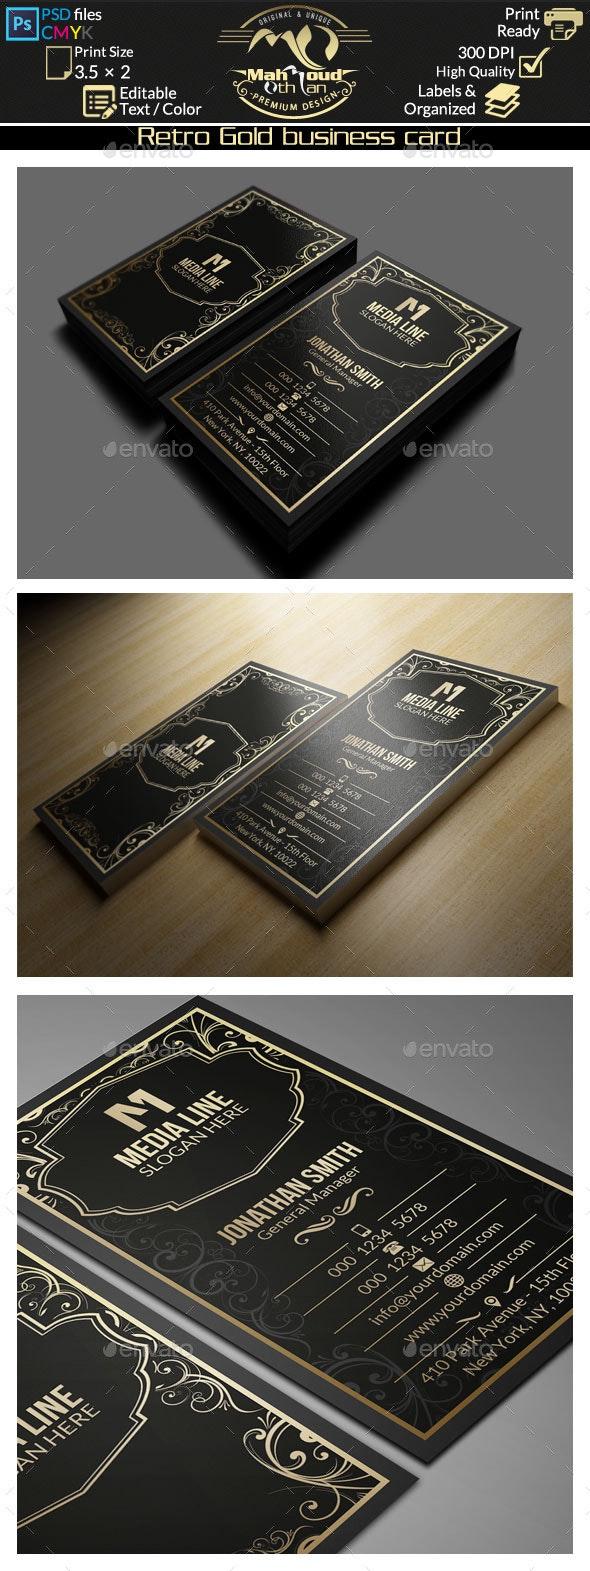 Retro Gold Business Card - Retro/Vintage Business Cards